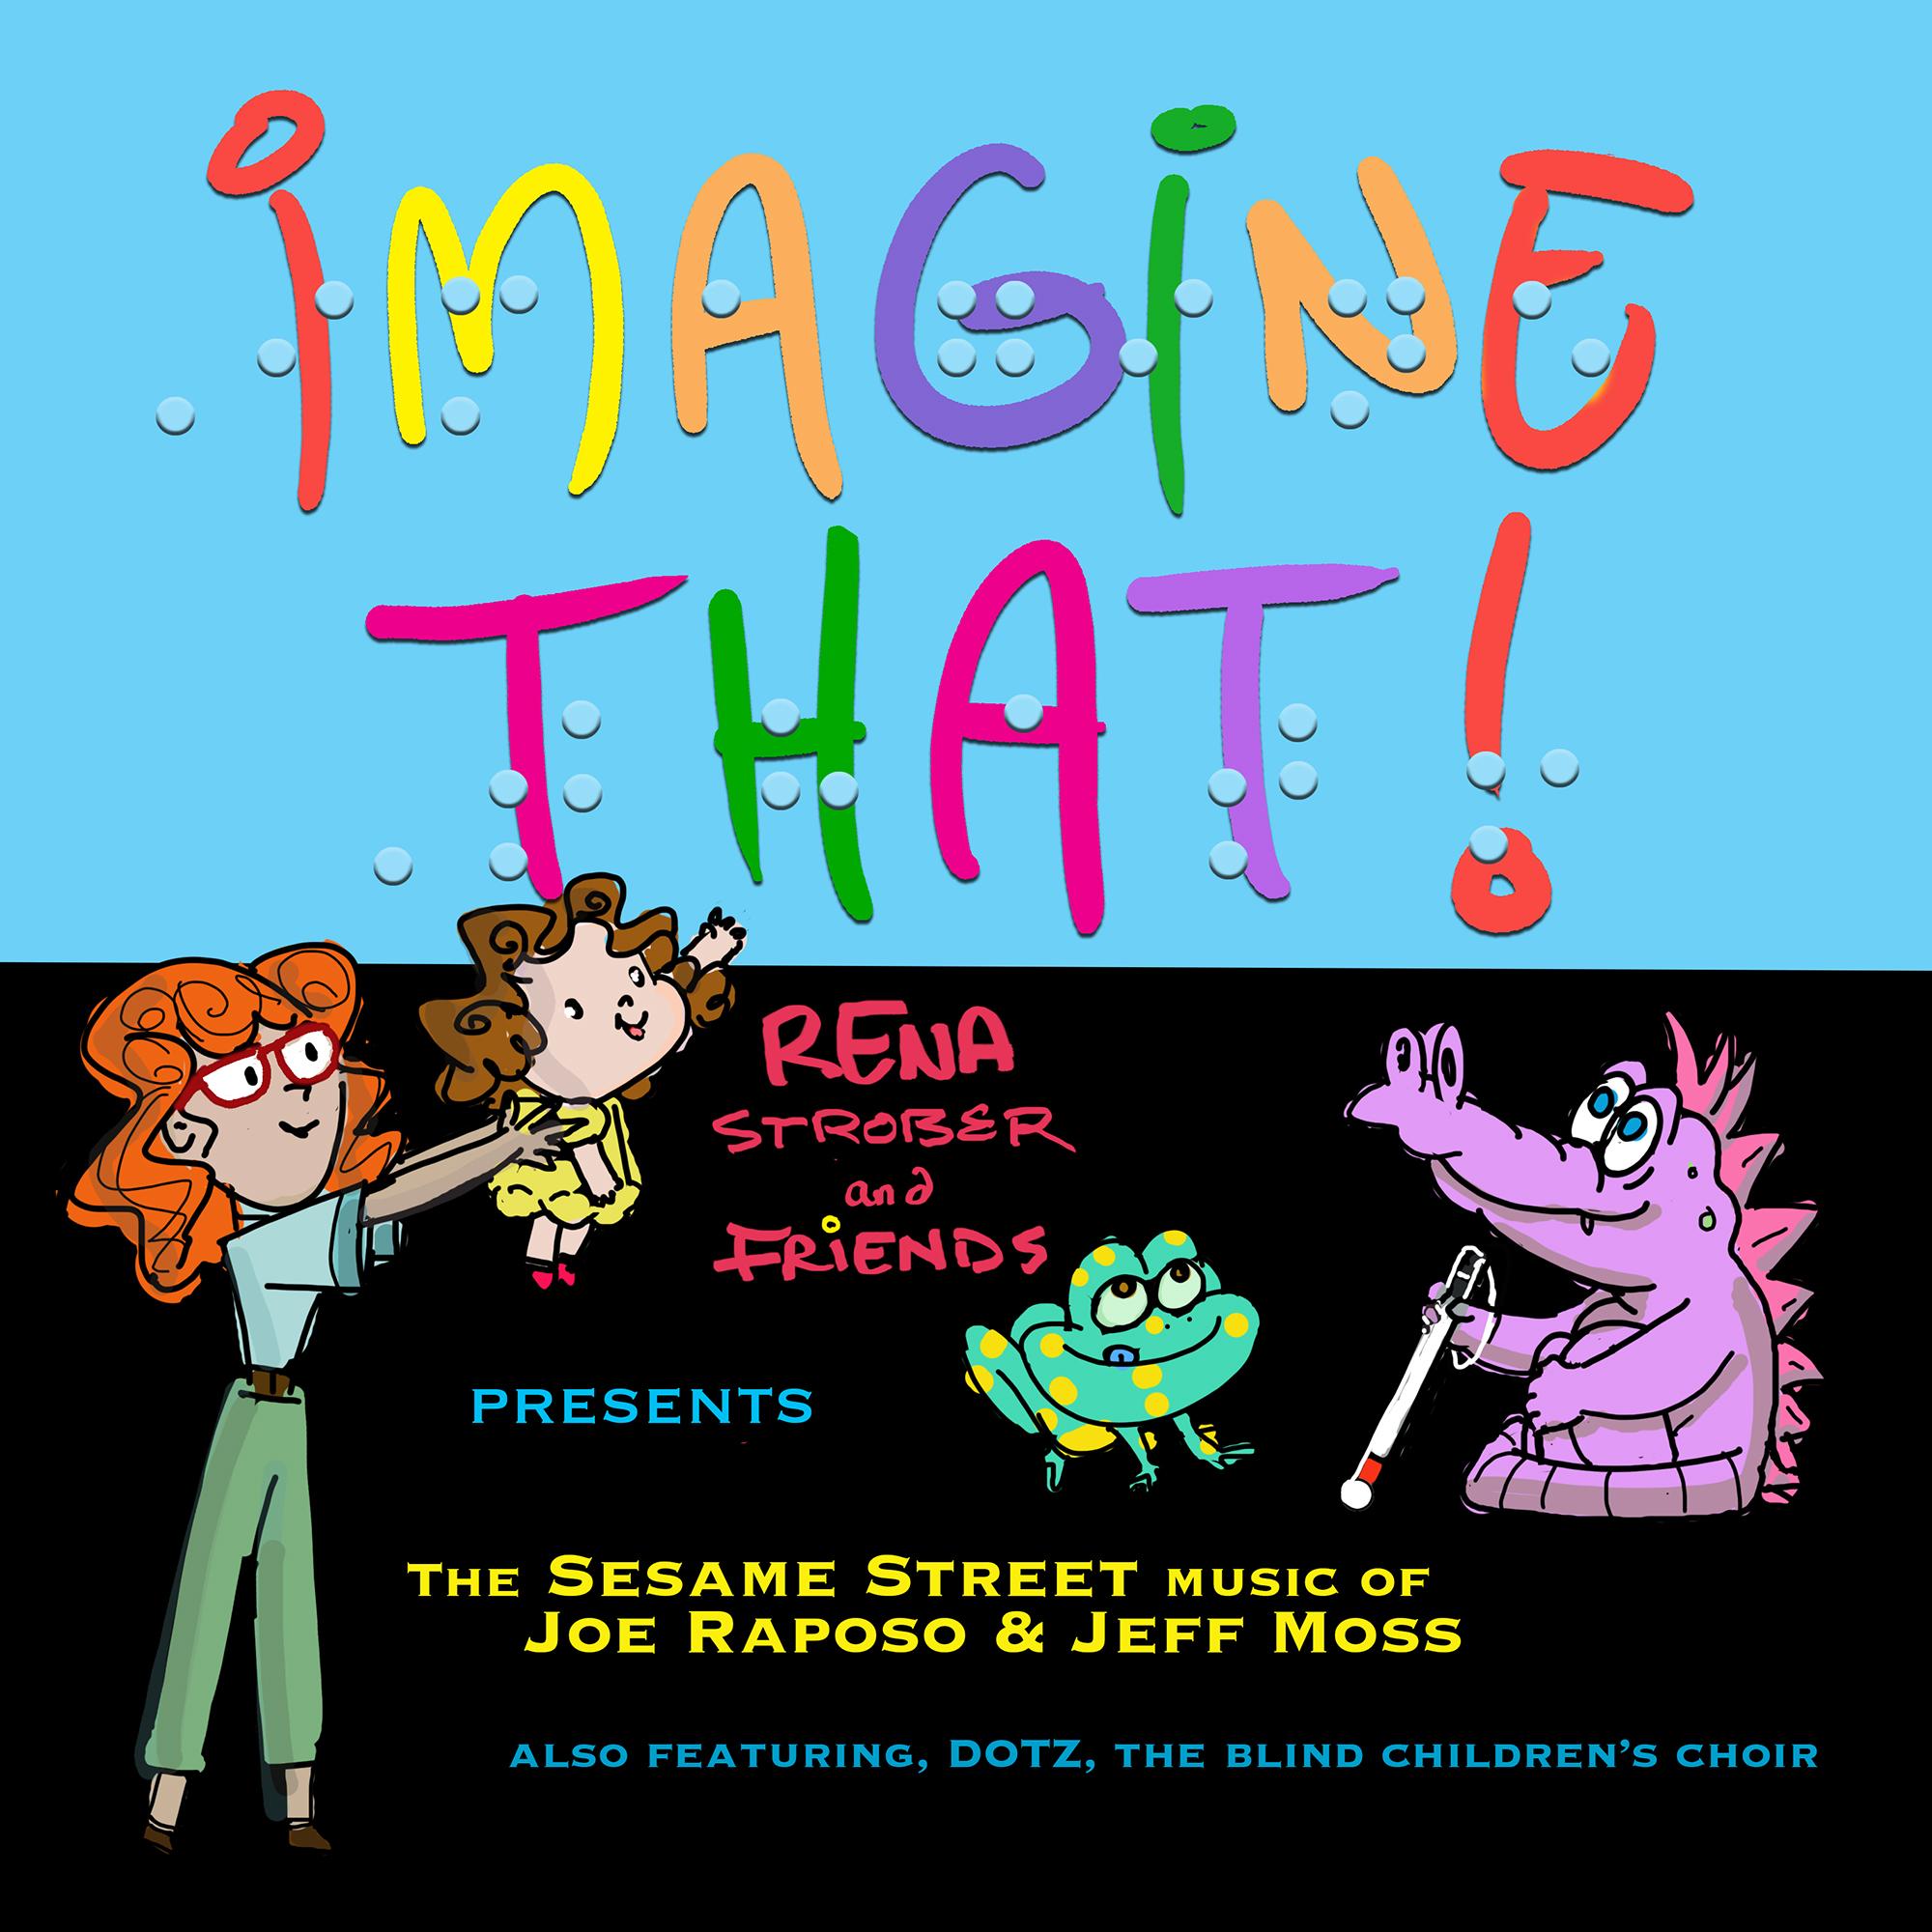 Imagine That! The Sesame Street music of Joe Raposo & Jeff Moss